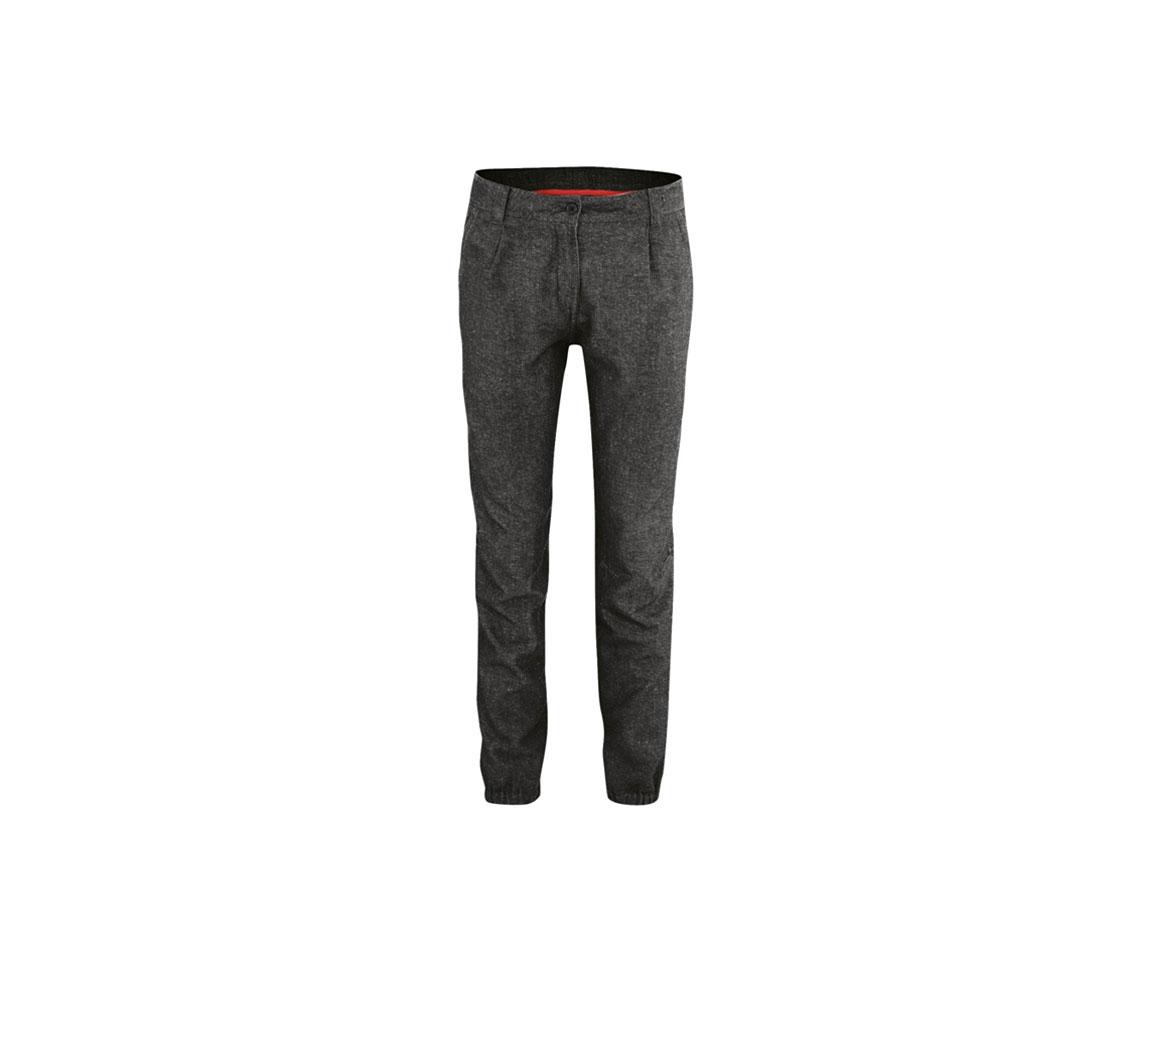 Pantalon femme en chanvre Chino Pants with elastic